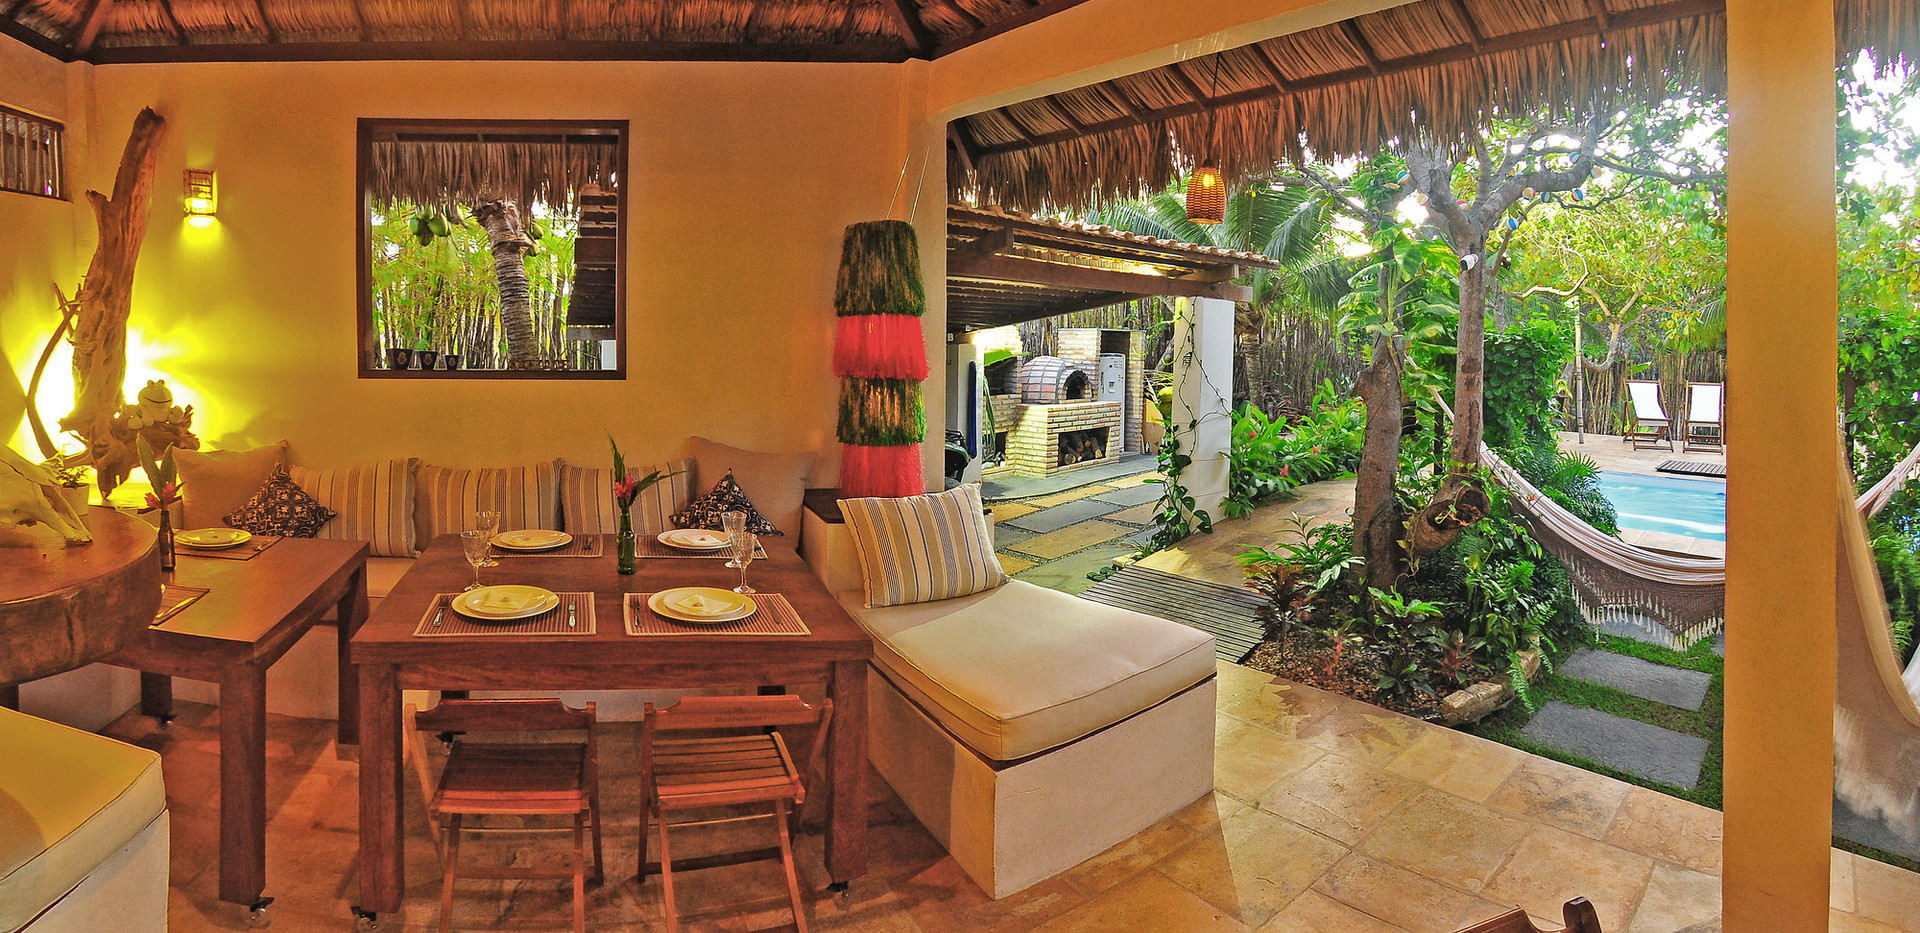 CasteloDoVentoPreaAccommodation-GardenLo